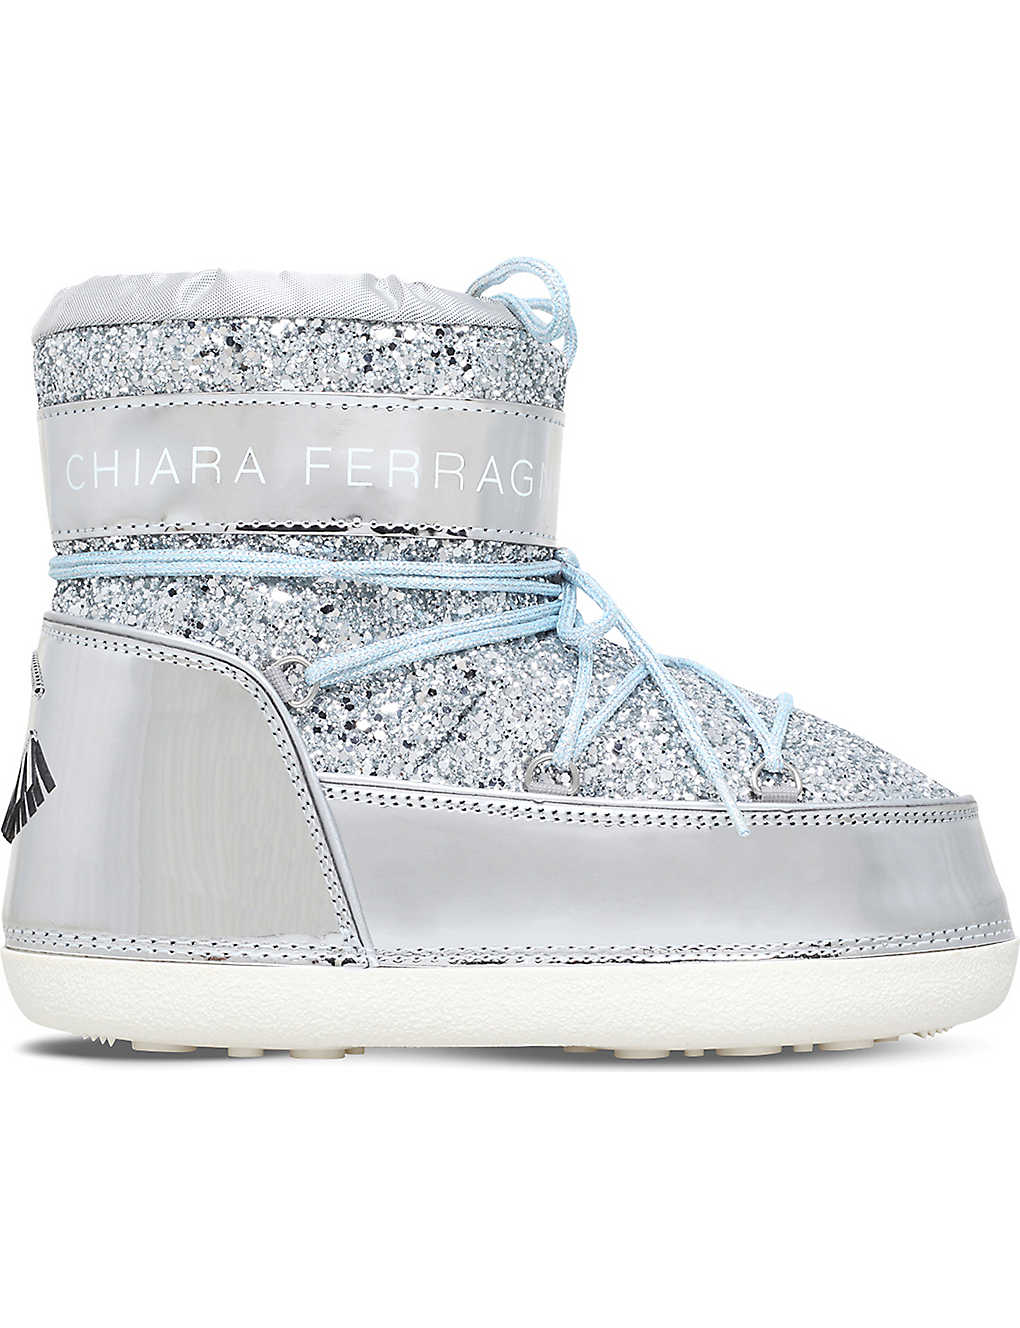 Chiara Ferragni Glitter snow boots vgwgyh